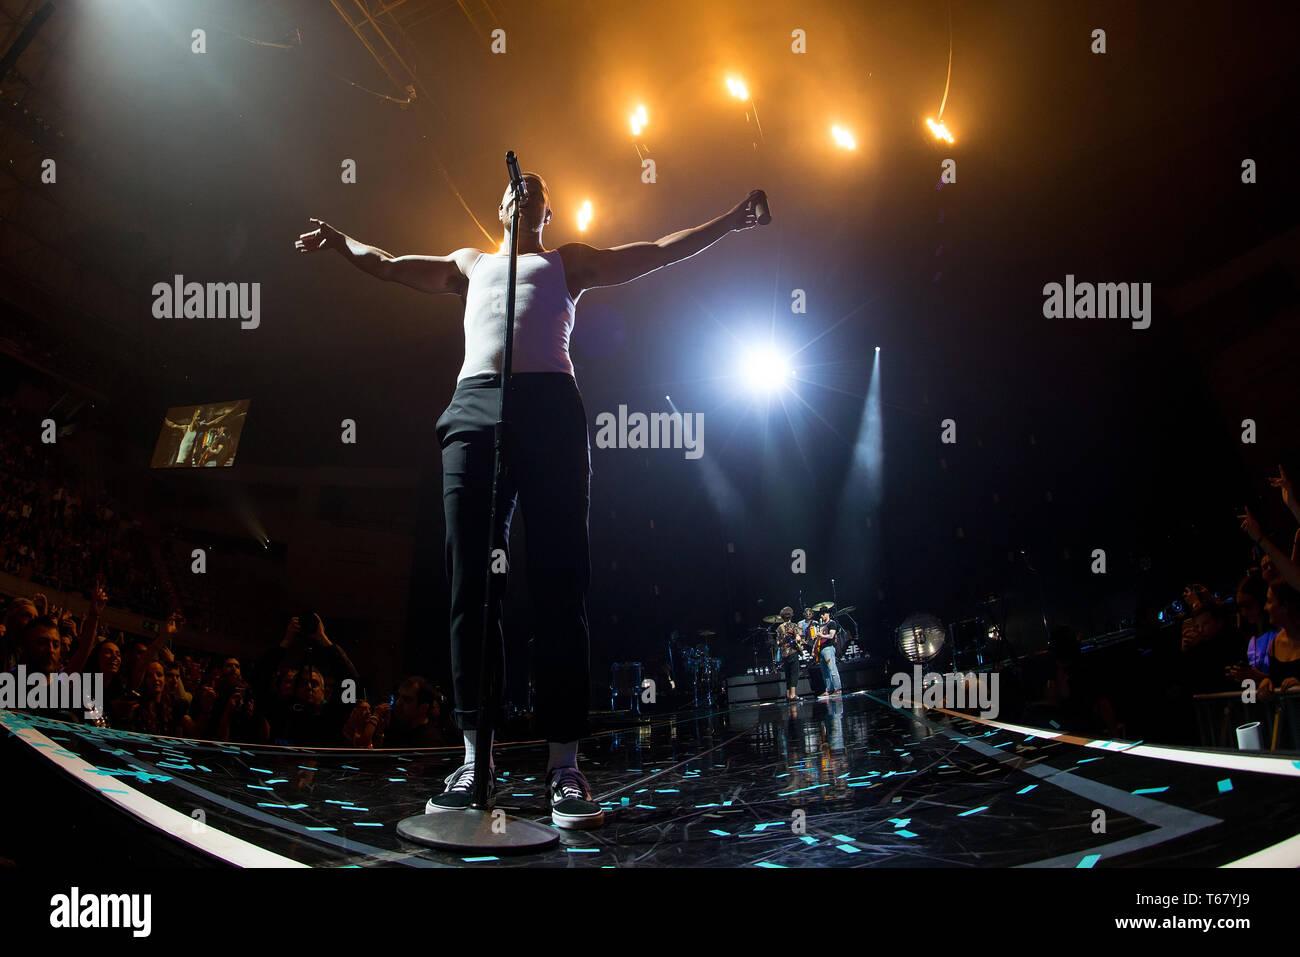 BARCELONA - APR 6: Imagine Dragons (pop music band) perform in concert at Palau Sant Jordi stage on April 6, 2018 in Barcelona, Spain. - Stock Image